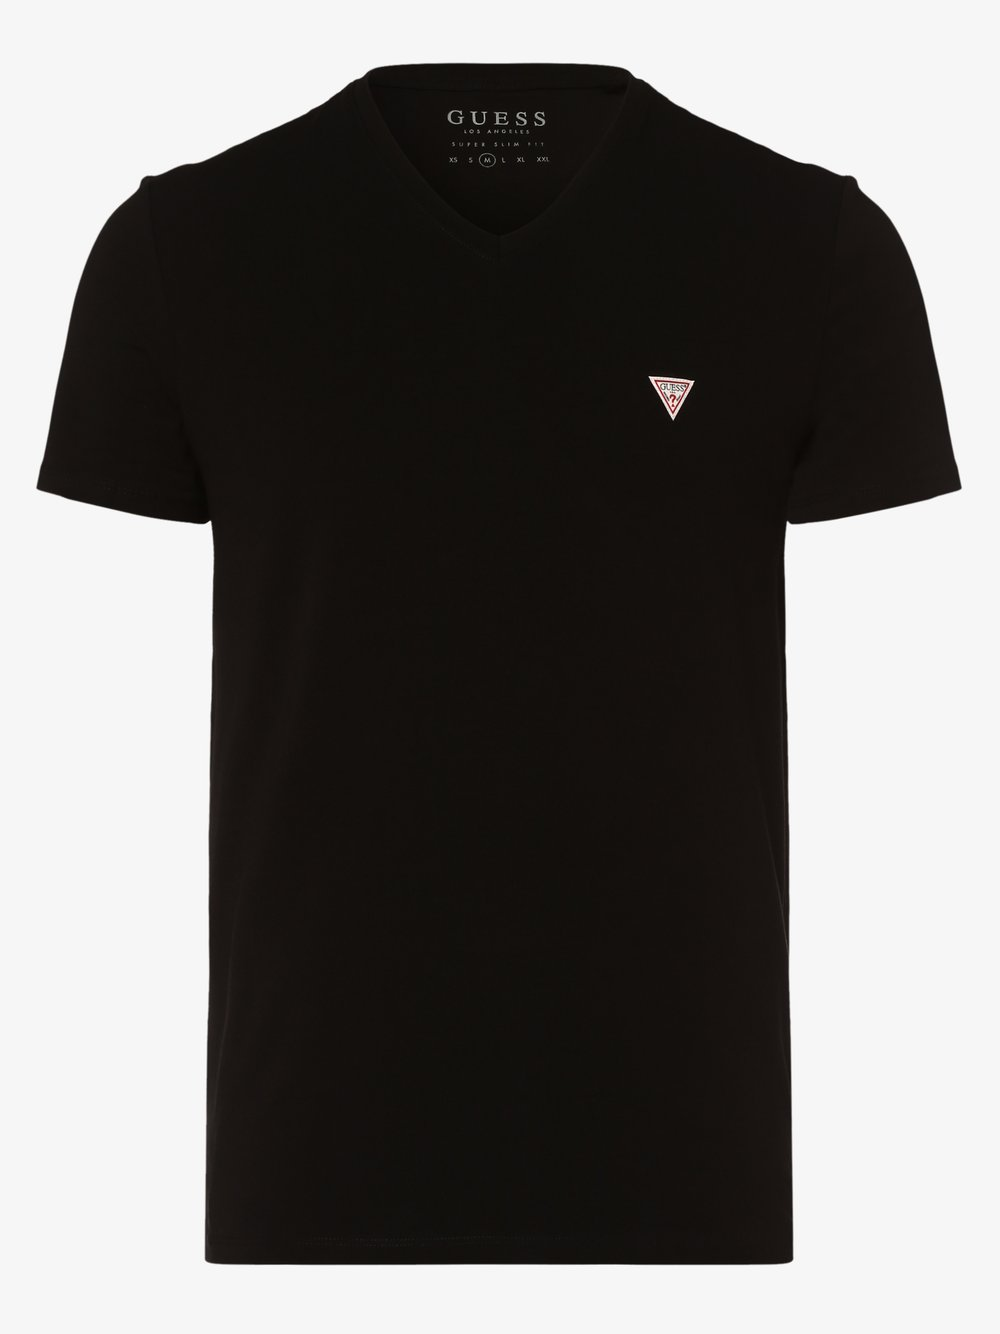 GUESS - T-shirt męski, czarny